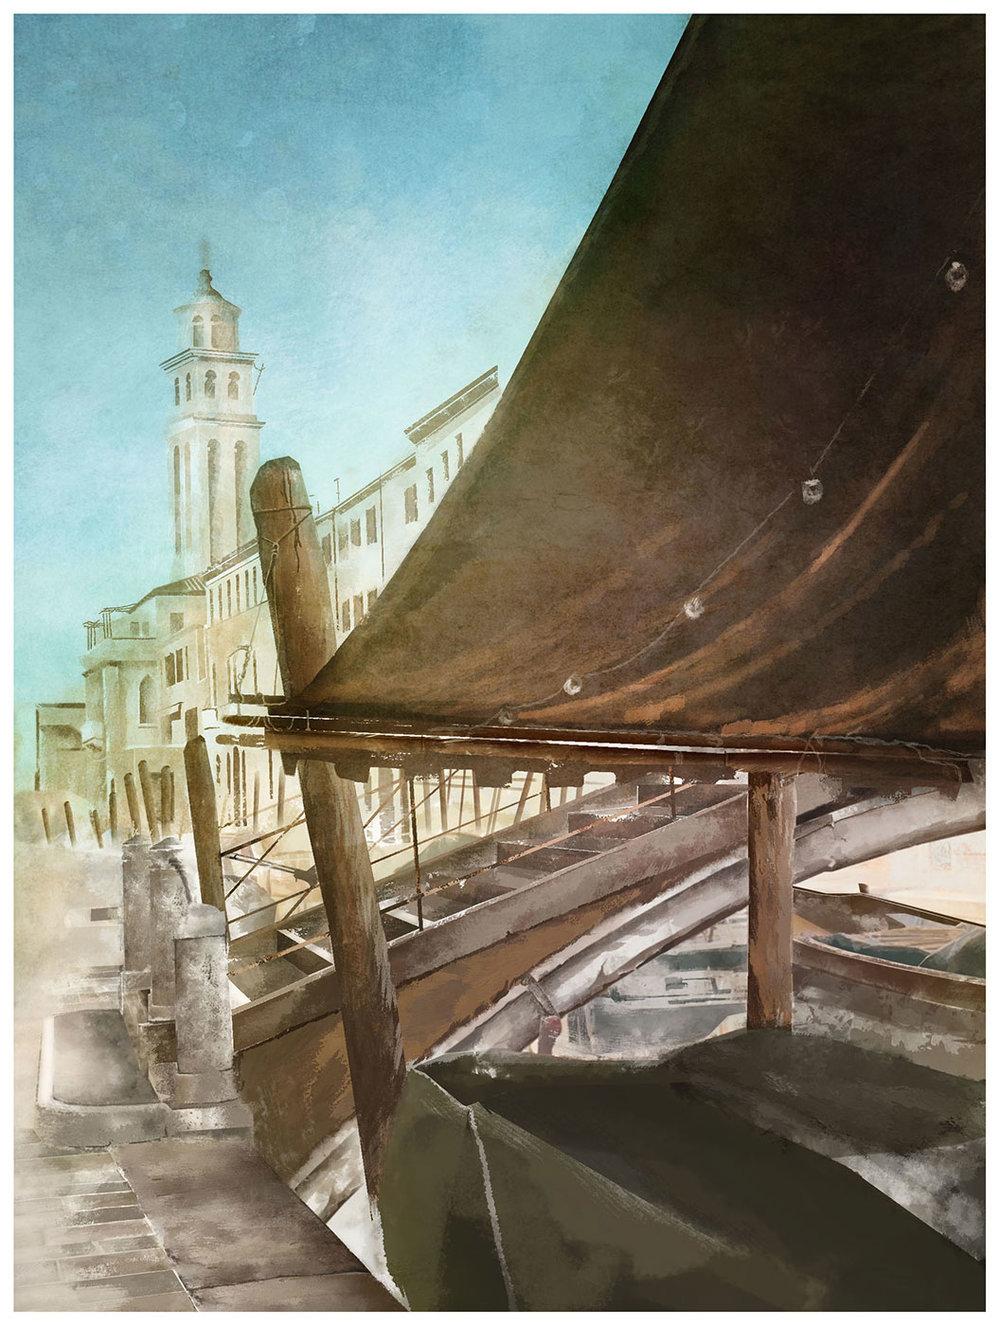 Venezia_Bridge_Atelier-Crilo.jpg